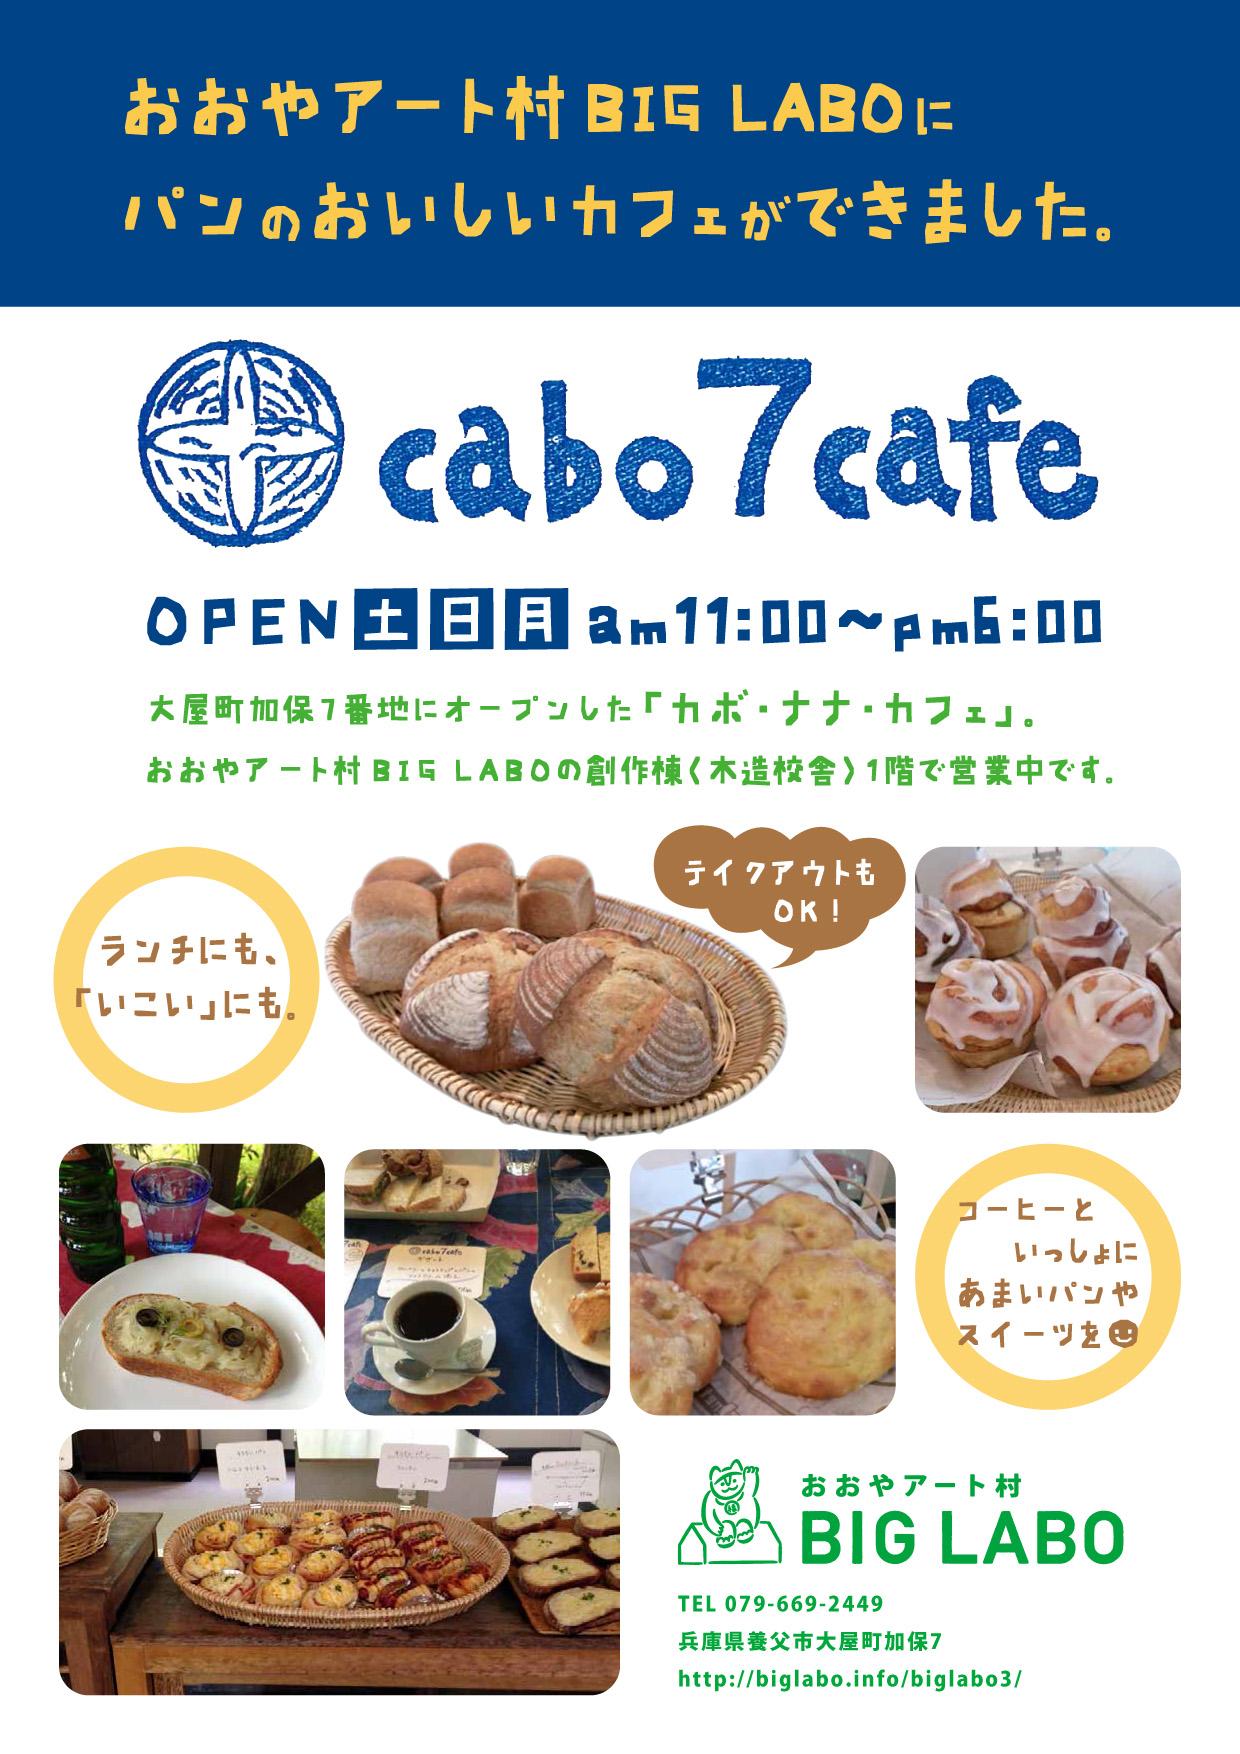 cabo7cafe 営業時間 am11:30-pm4:30です。